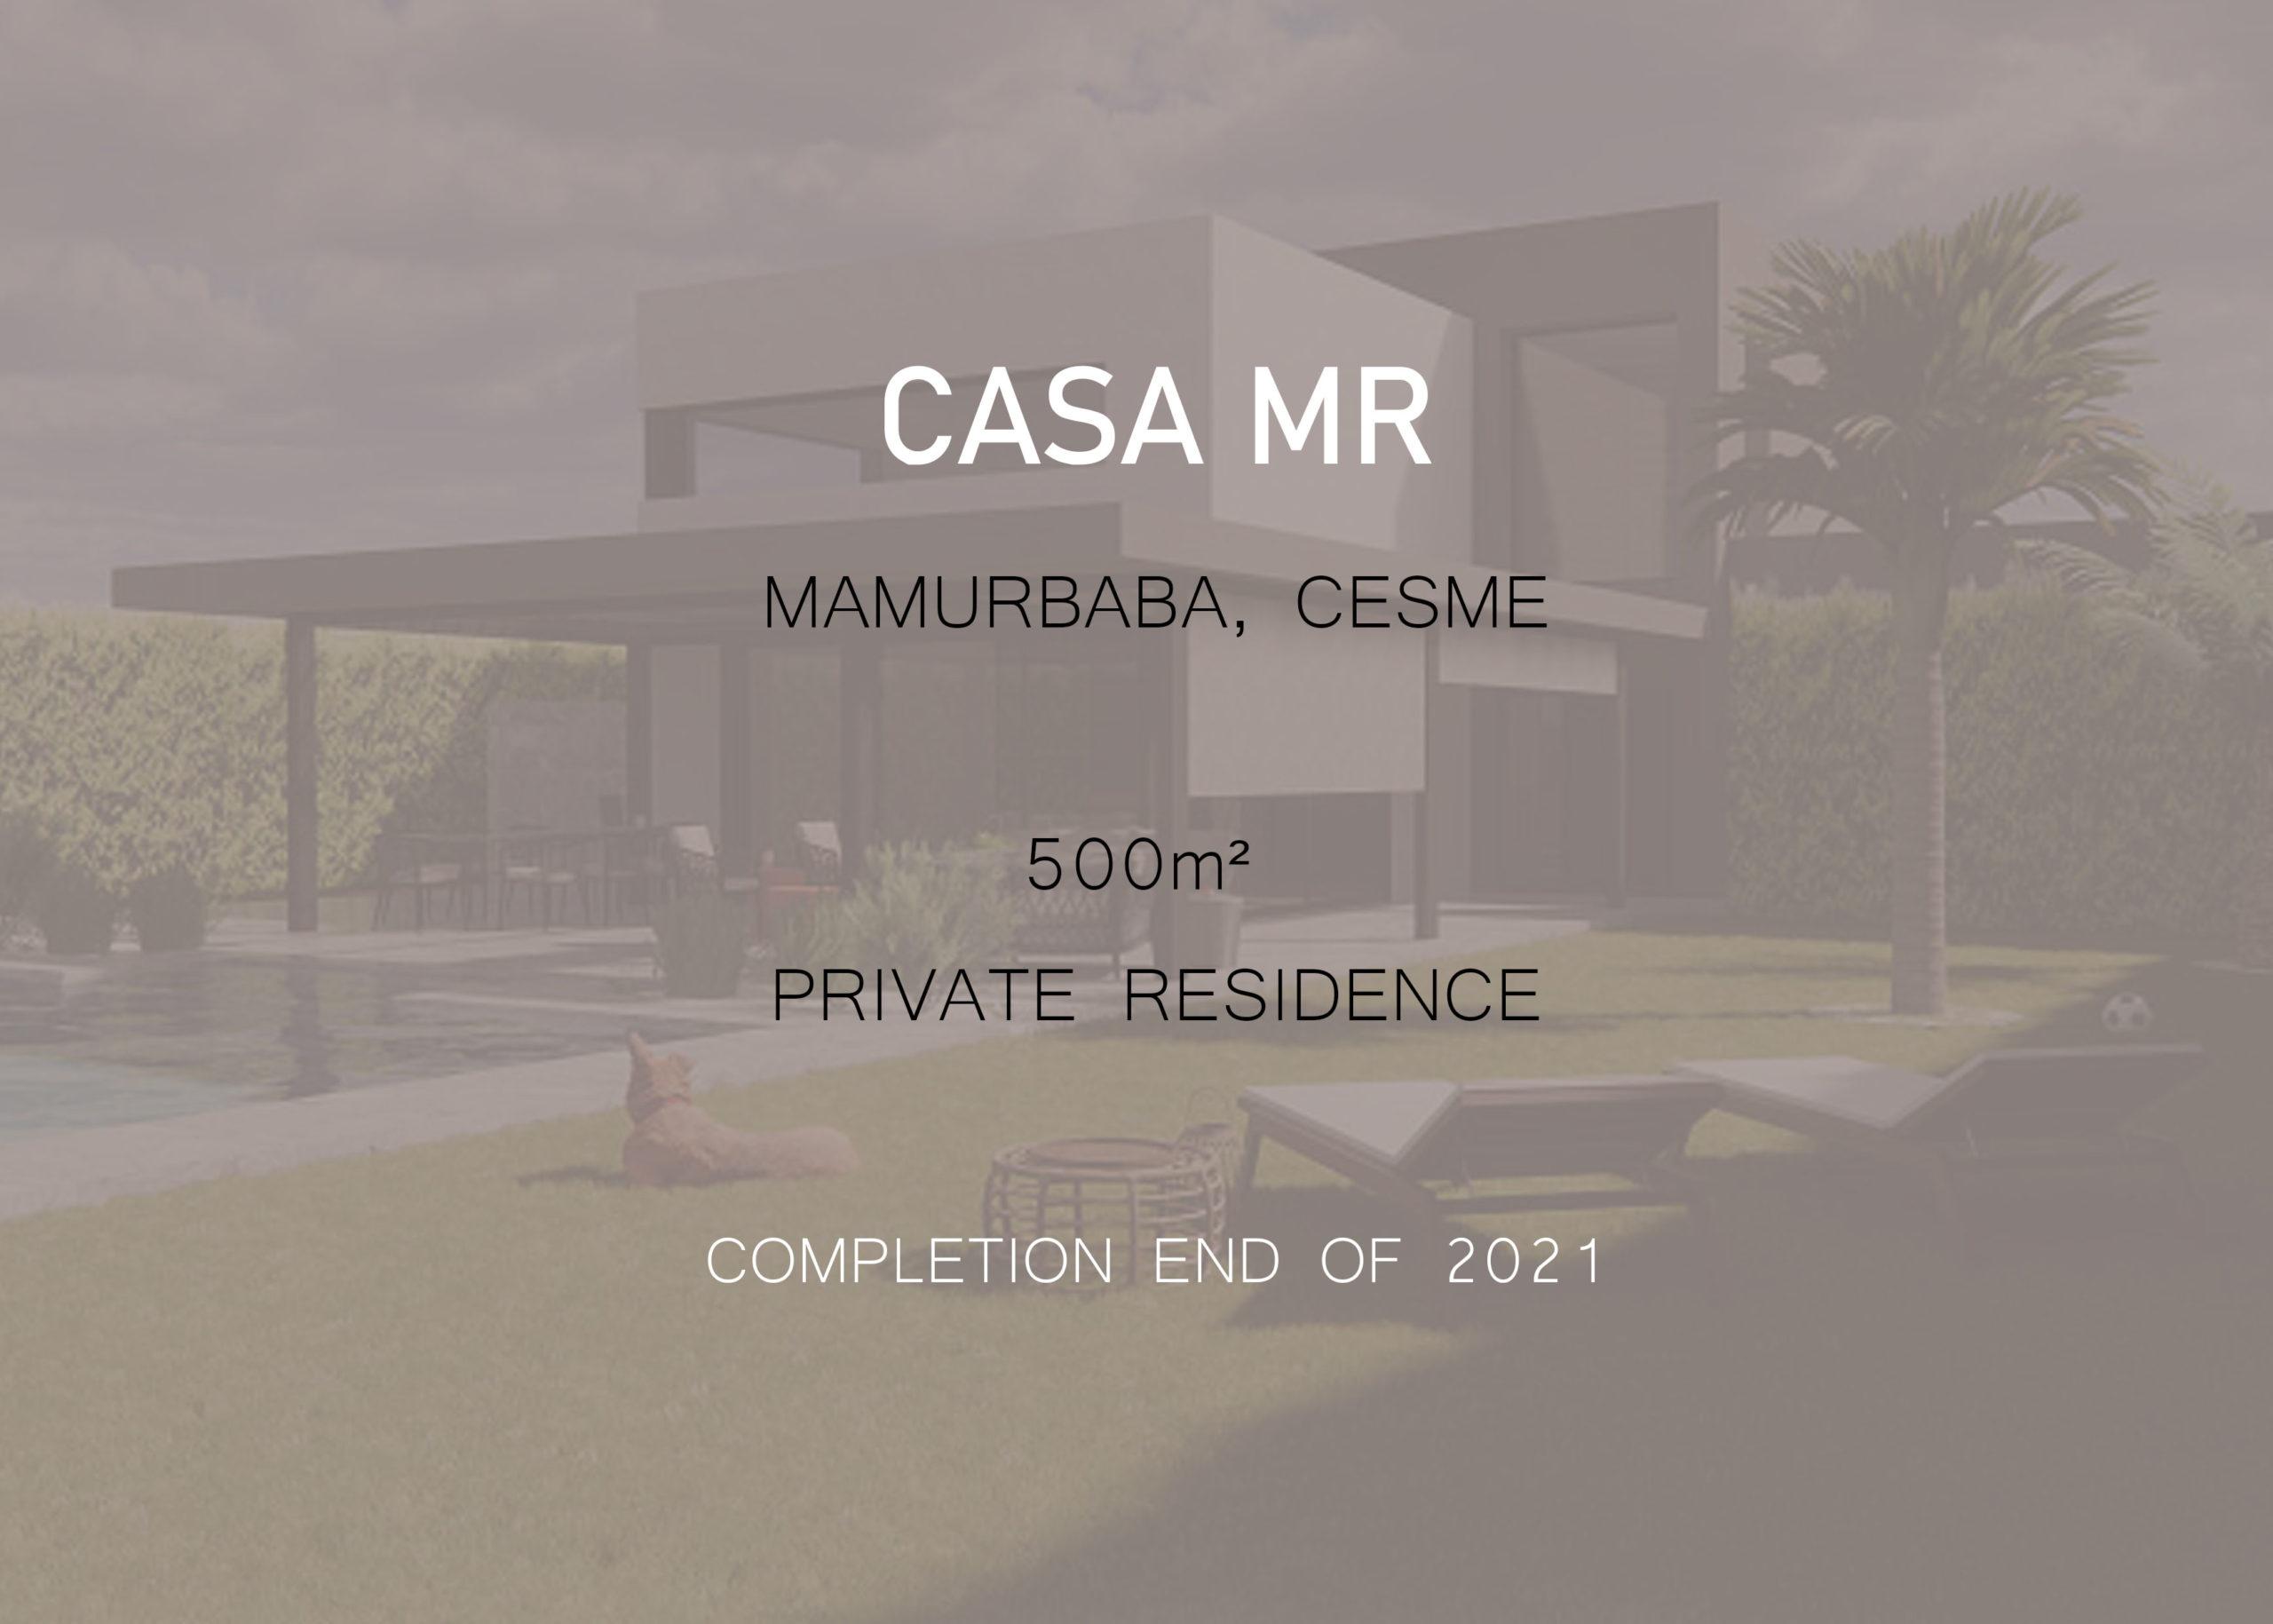 CASA MR – Mamurbaba, Cesme